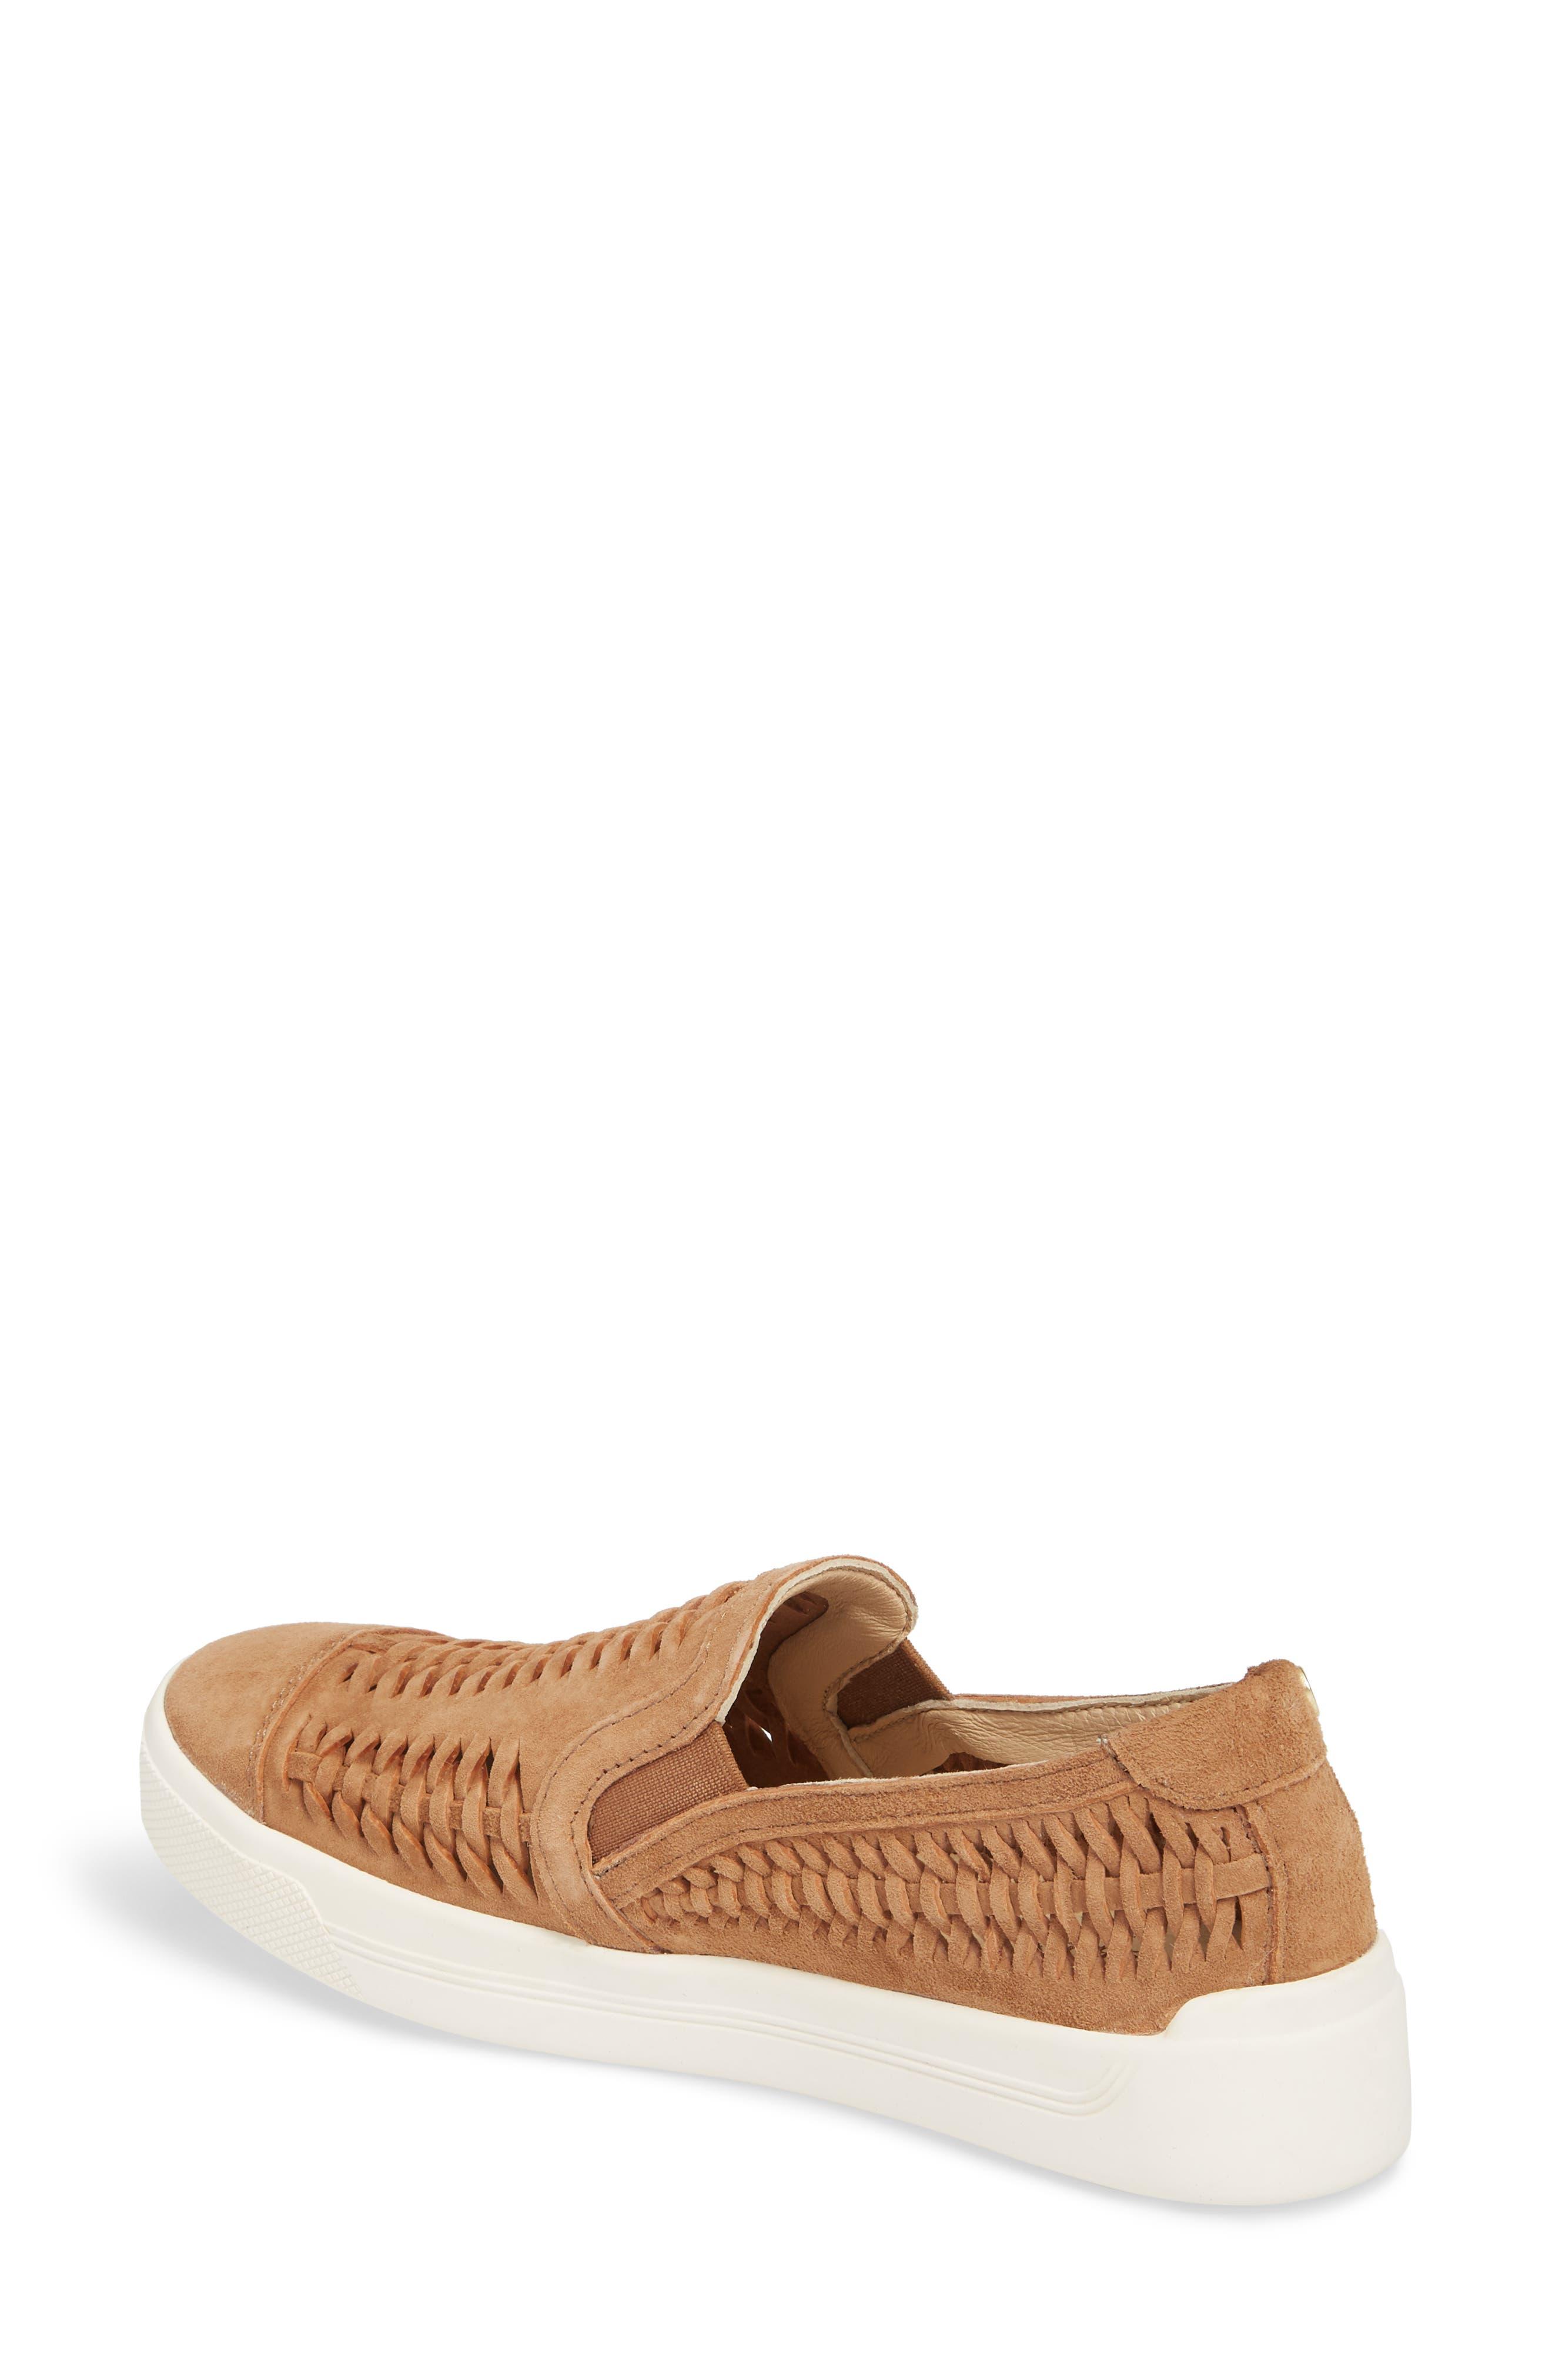 Gabbie Slip-On Sneaker,                             Alternate thumbnail 2, color,                             Tan Suede